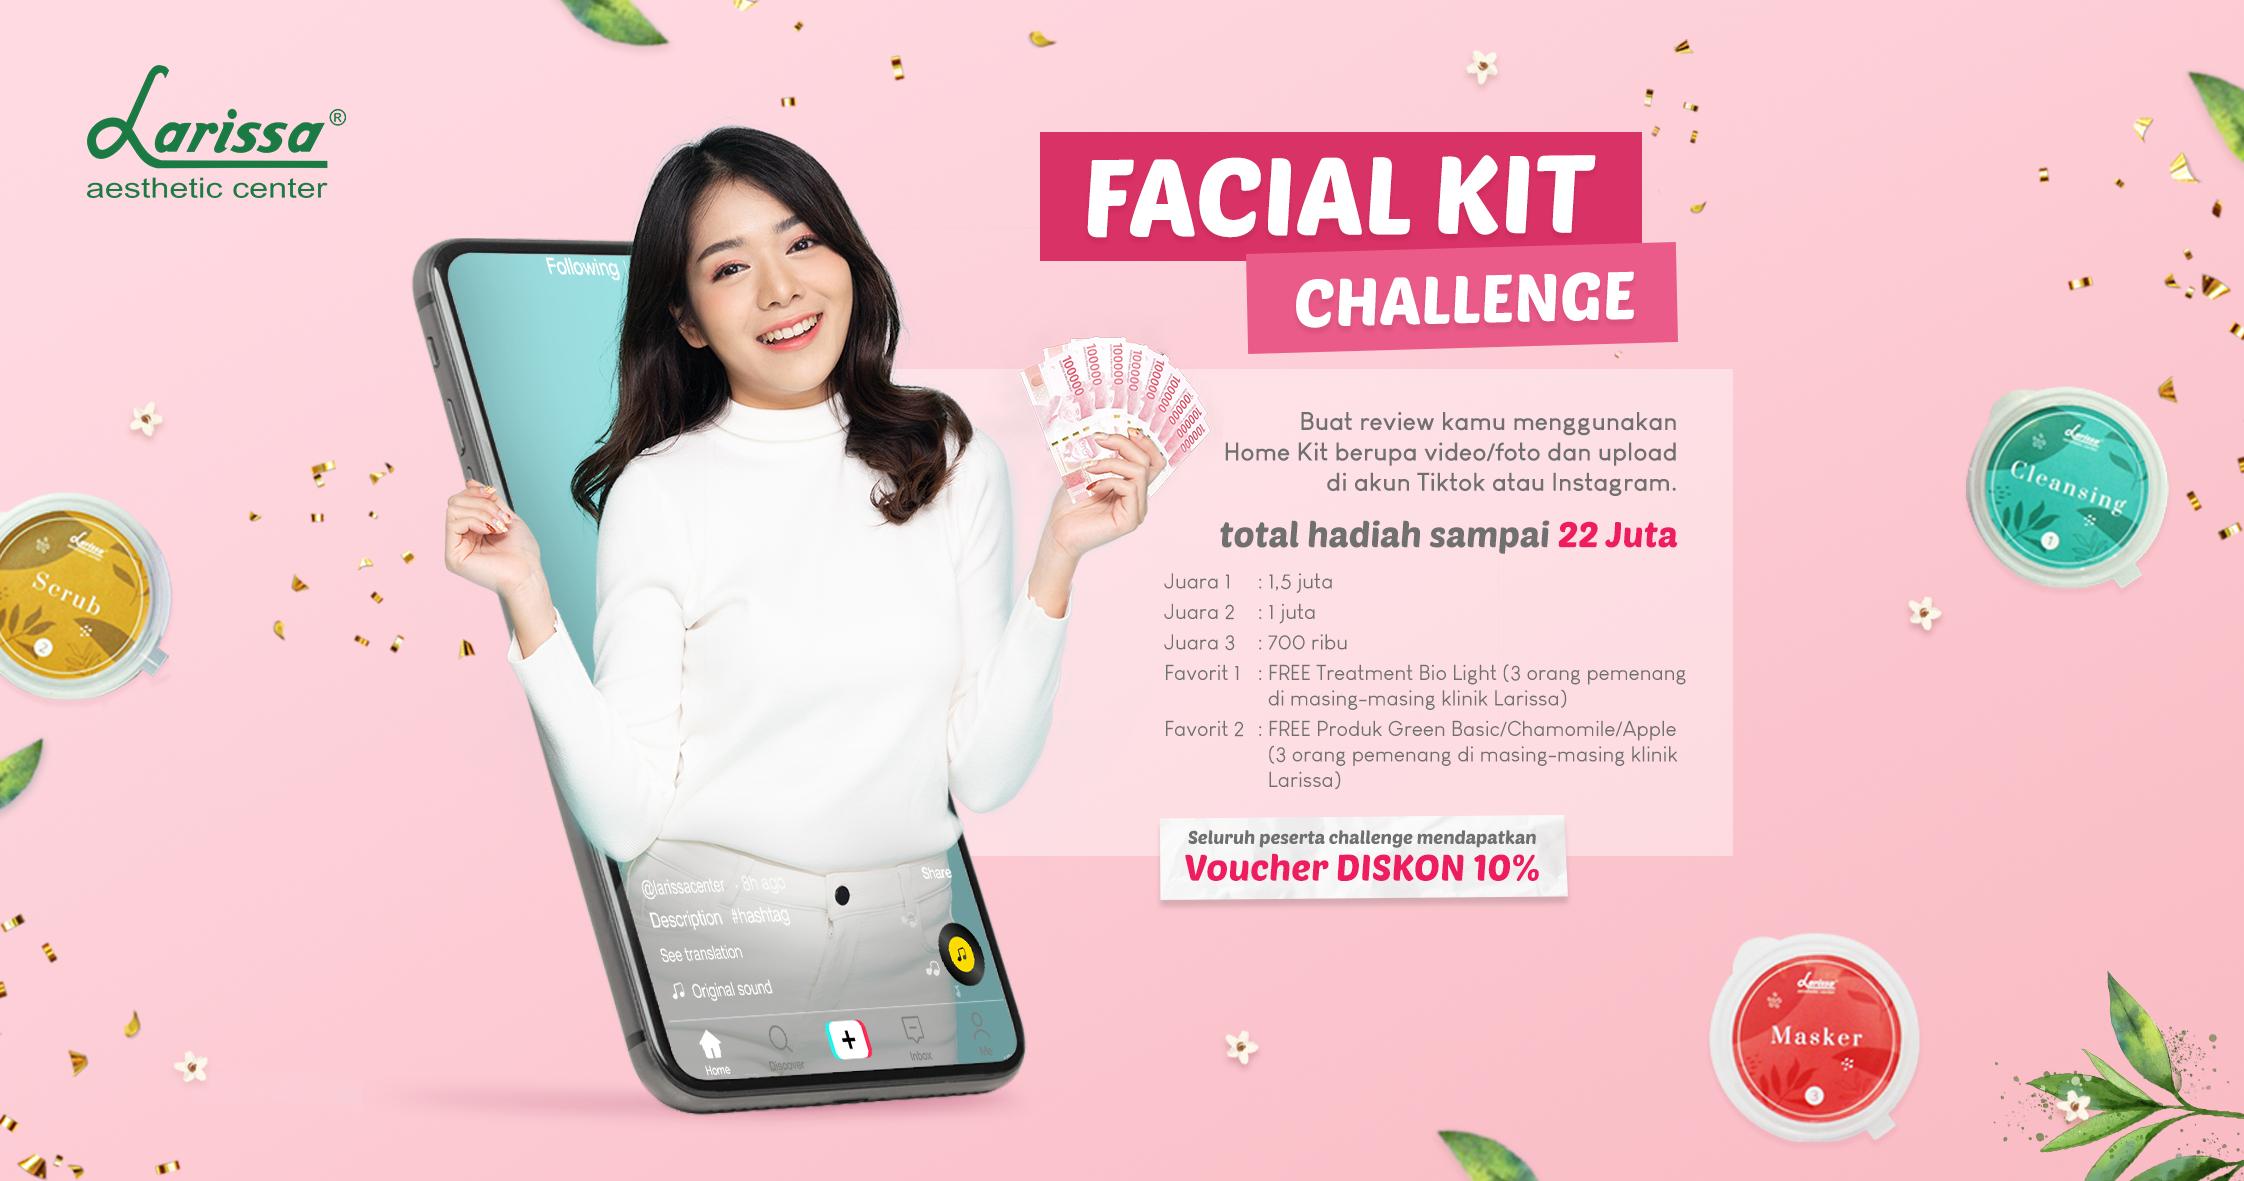 Wajib Ikutan, Facial Kit Challenge Larissa 2021!